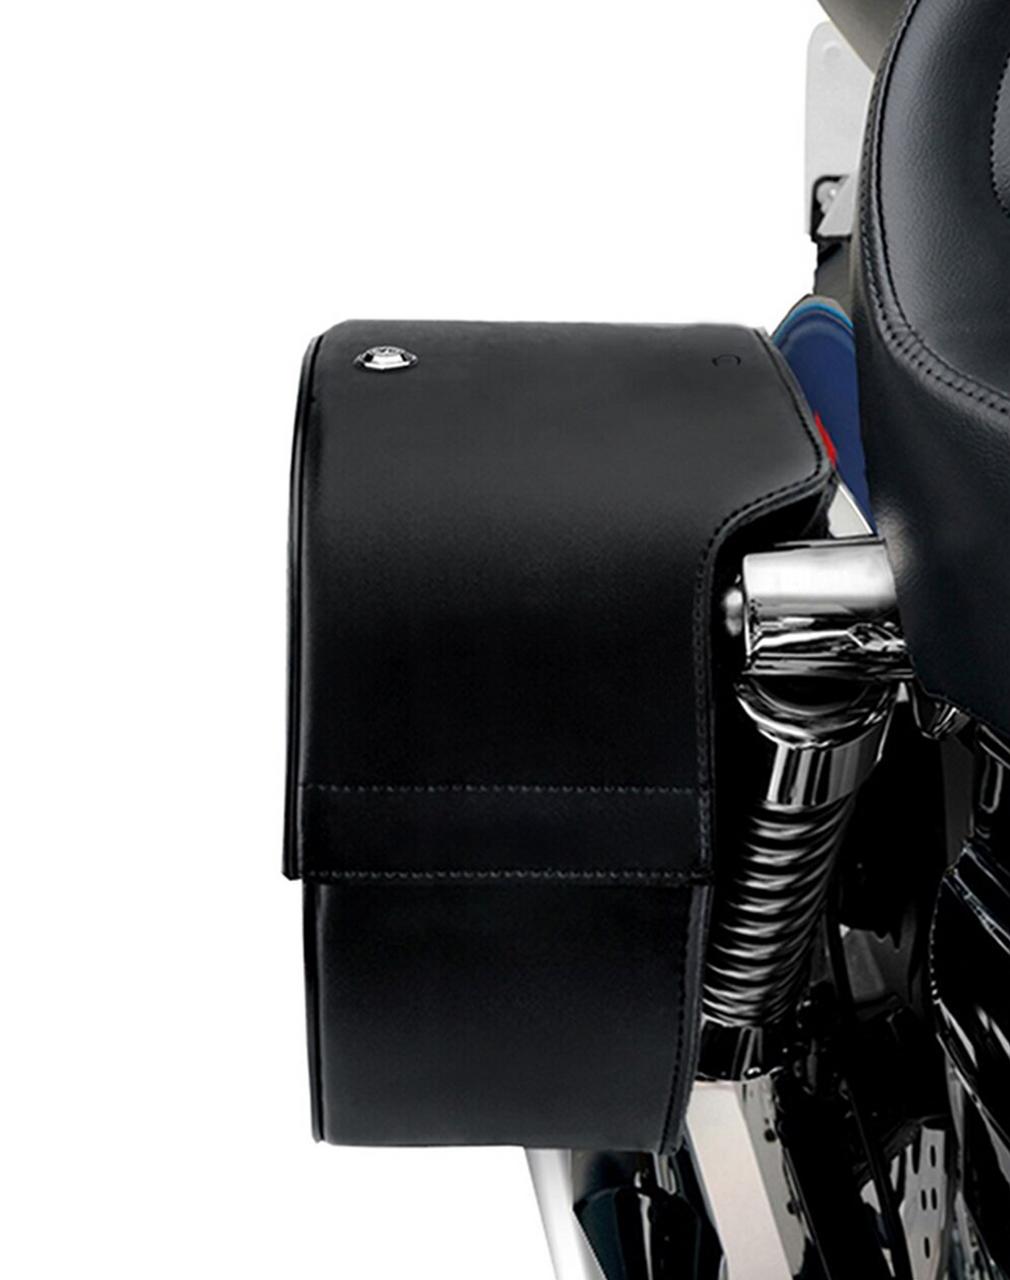 Viking Shock Cutout Warrior Slanted Large Motorcycle Saddlebags For Harley Street 750 Shock Cutout View